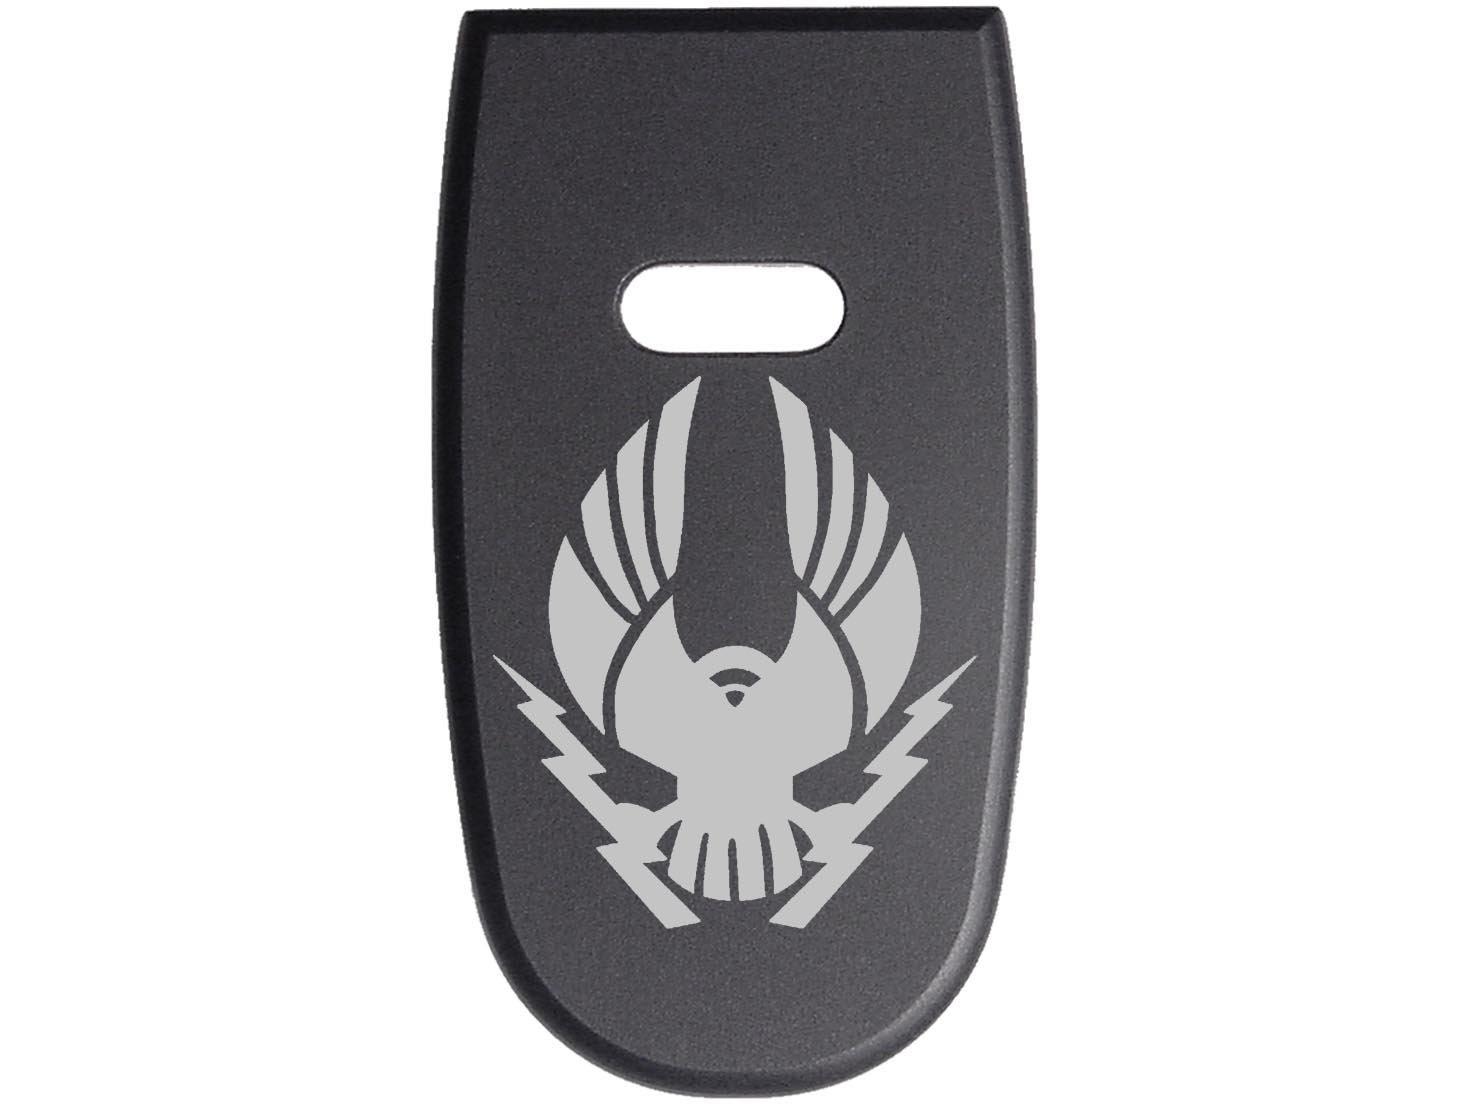 for S&W M&P Shield .45 Aluminum Floor Base Plate Black Custom Laser Engraved: Military Eagle Lightning By NDZ Performance